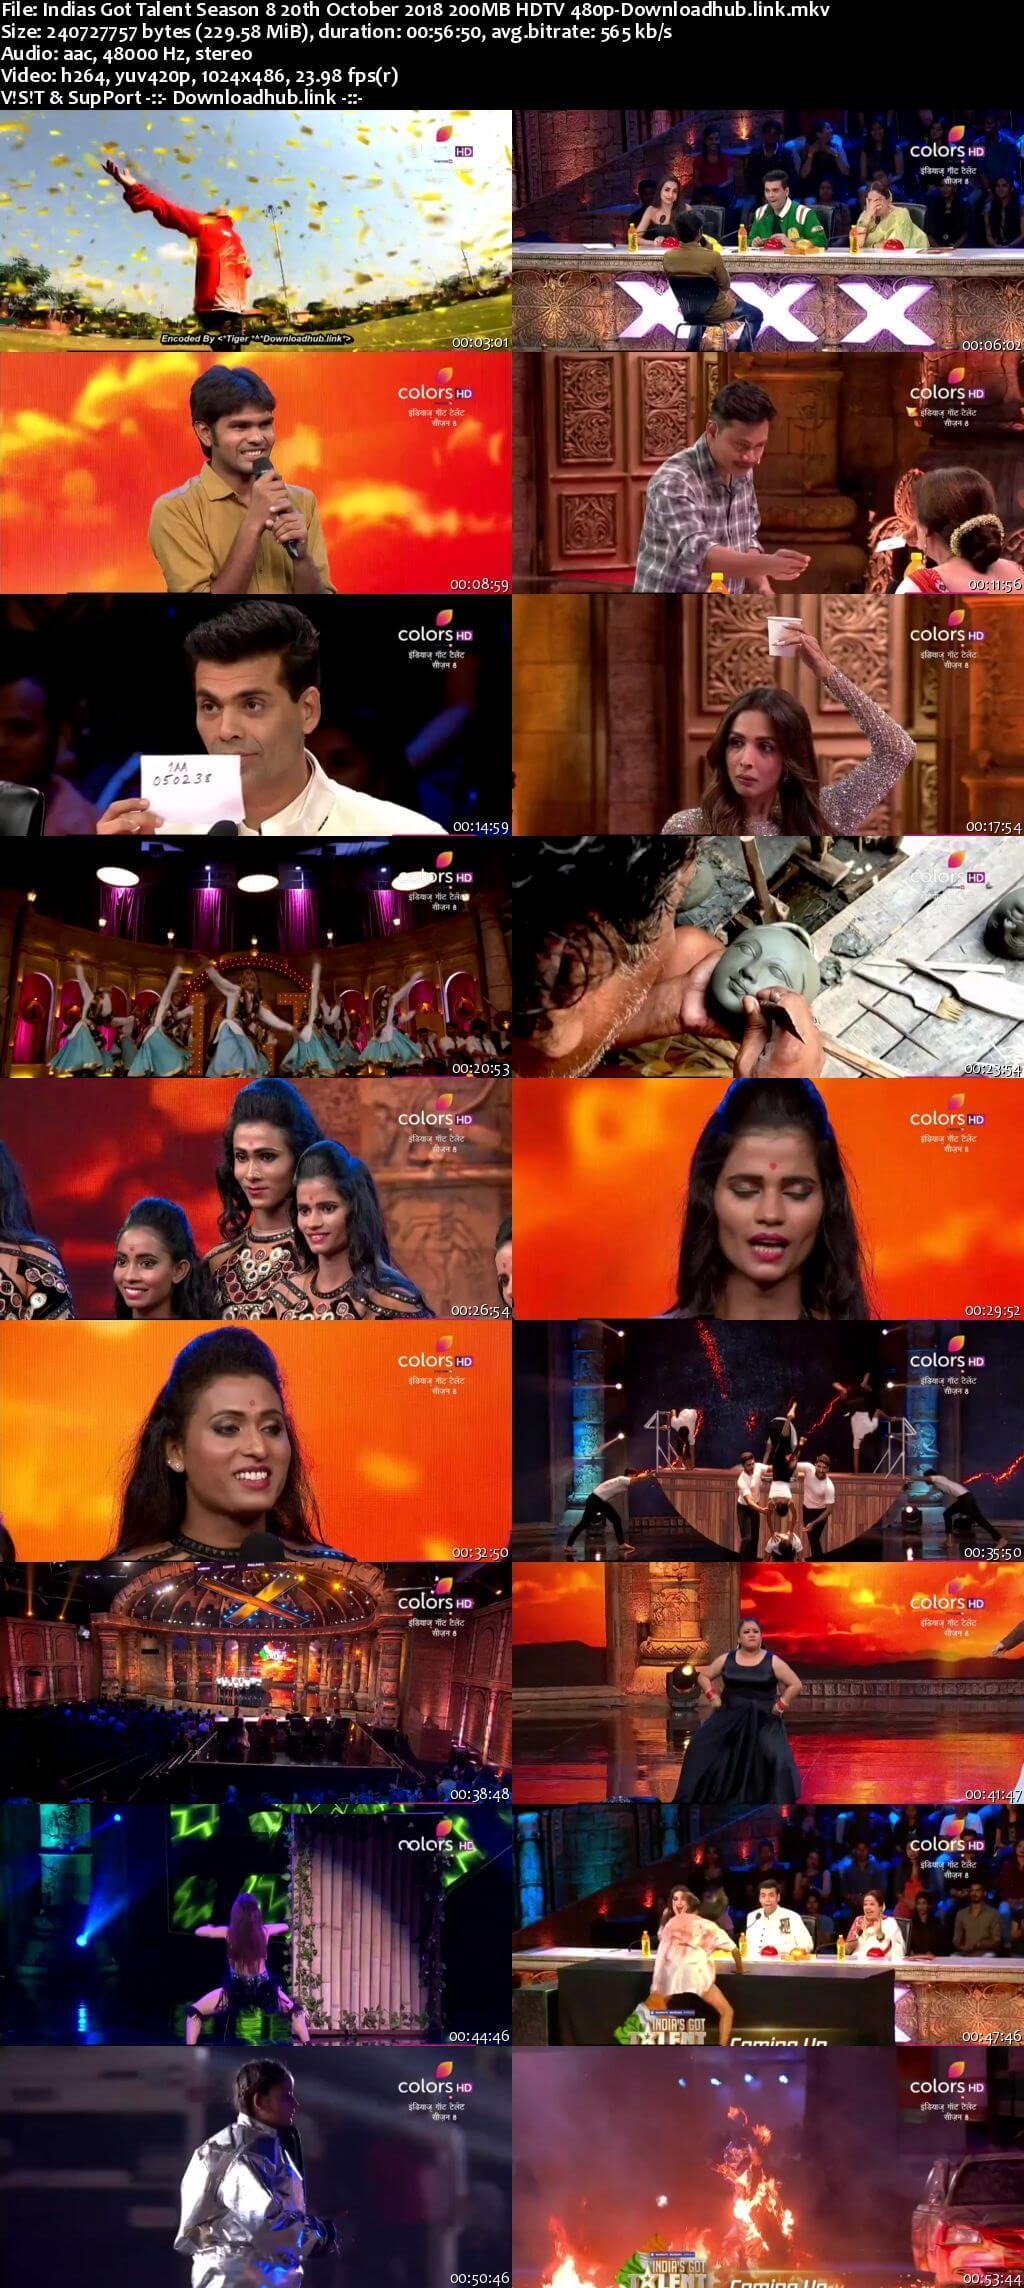 Indias Got Talent Season 8 20 October 2018 Episode 01 HDTV 480p